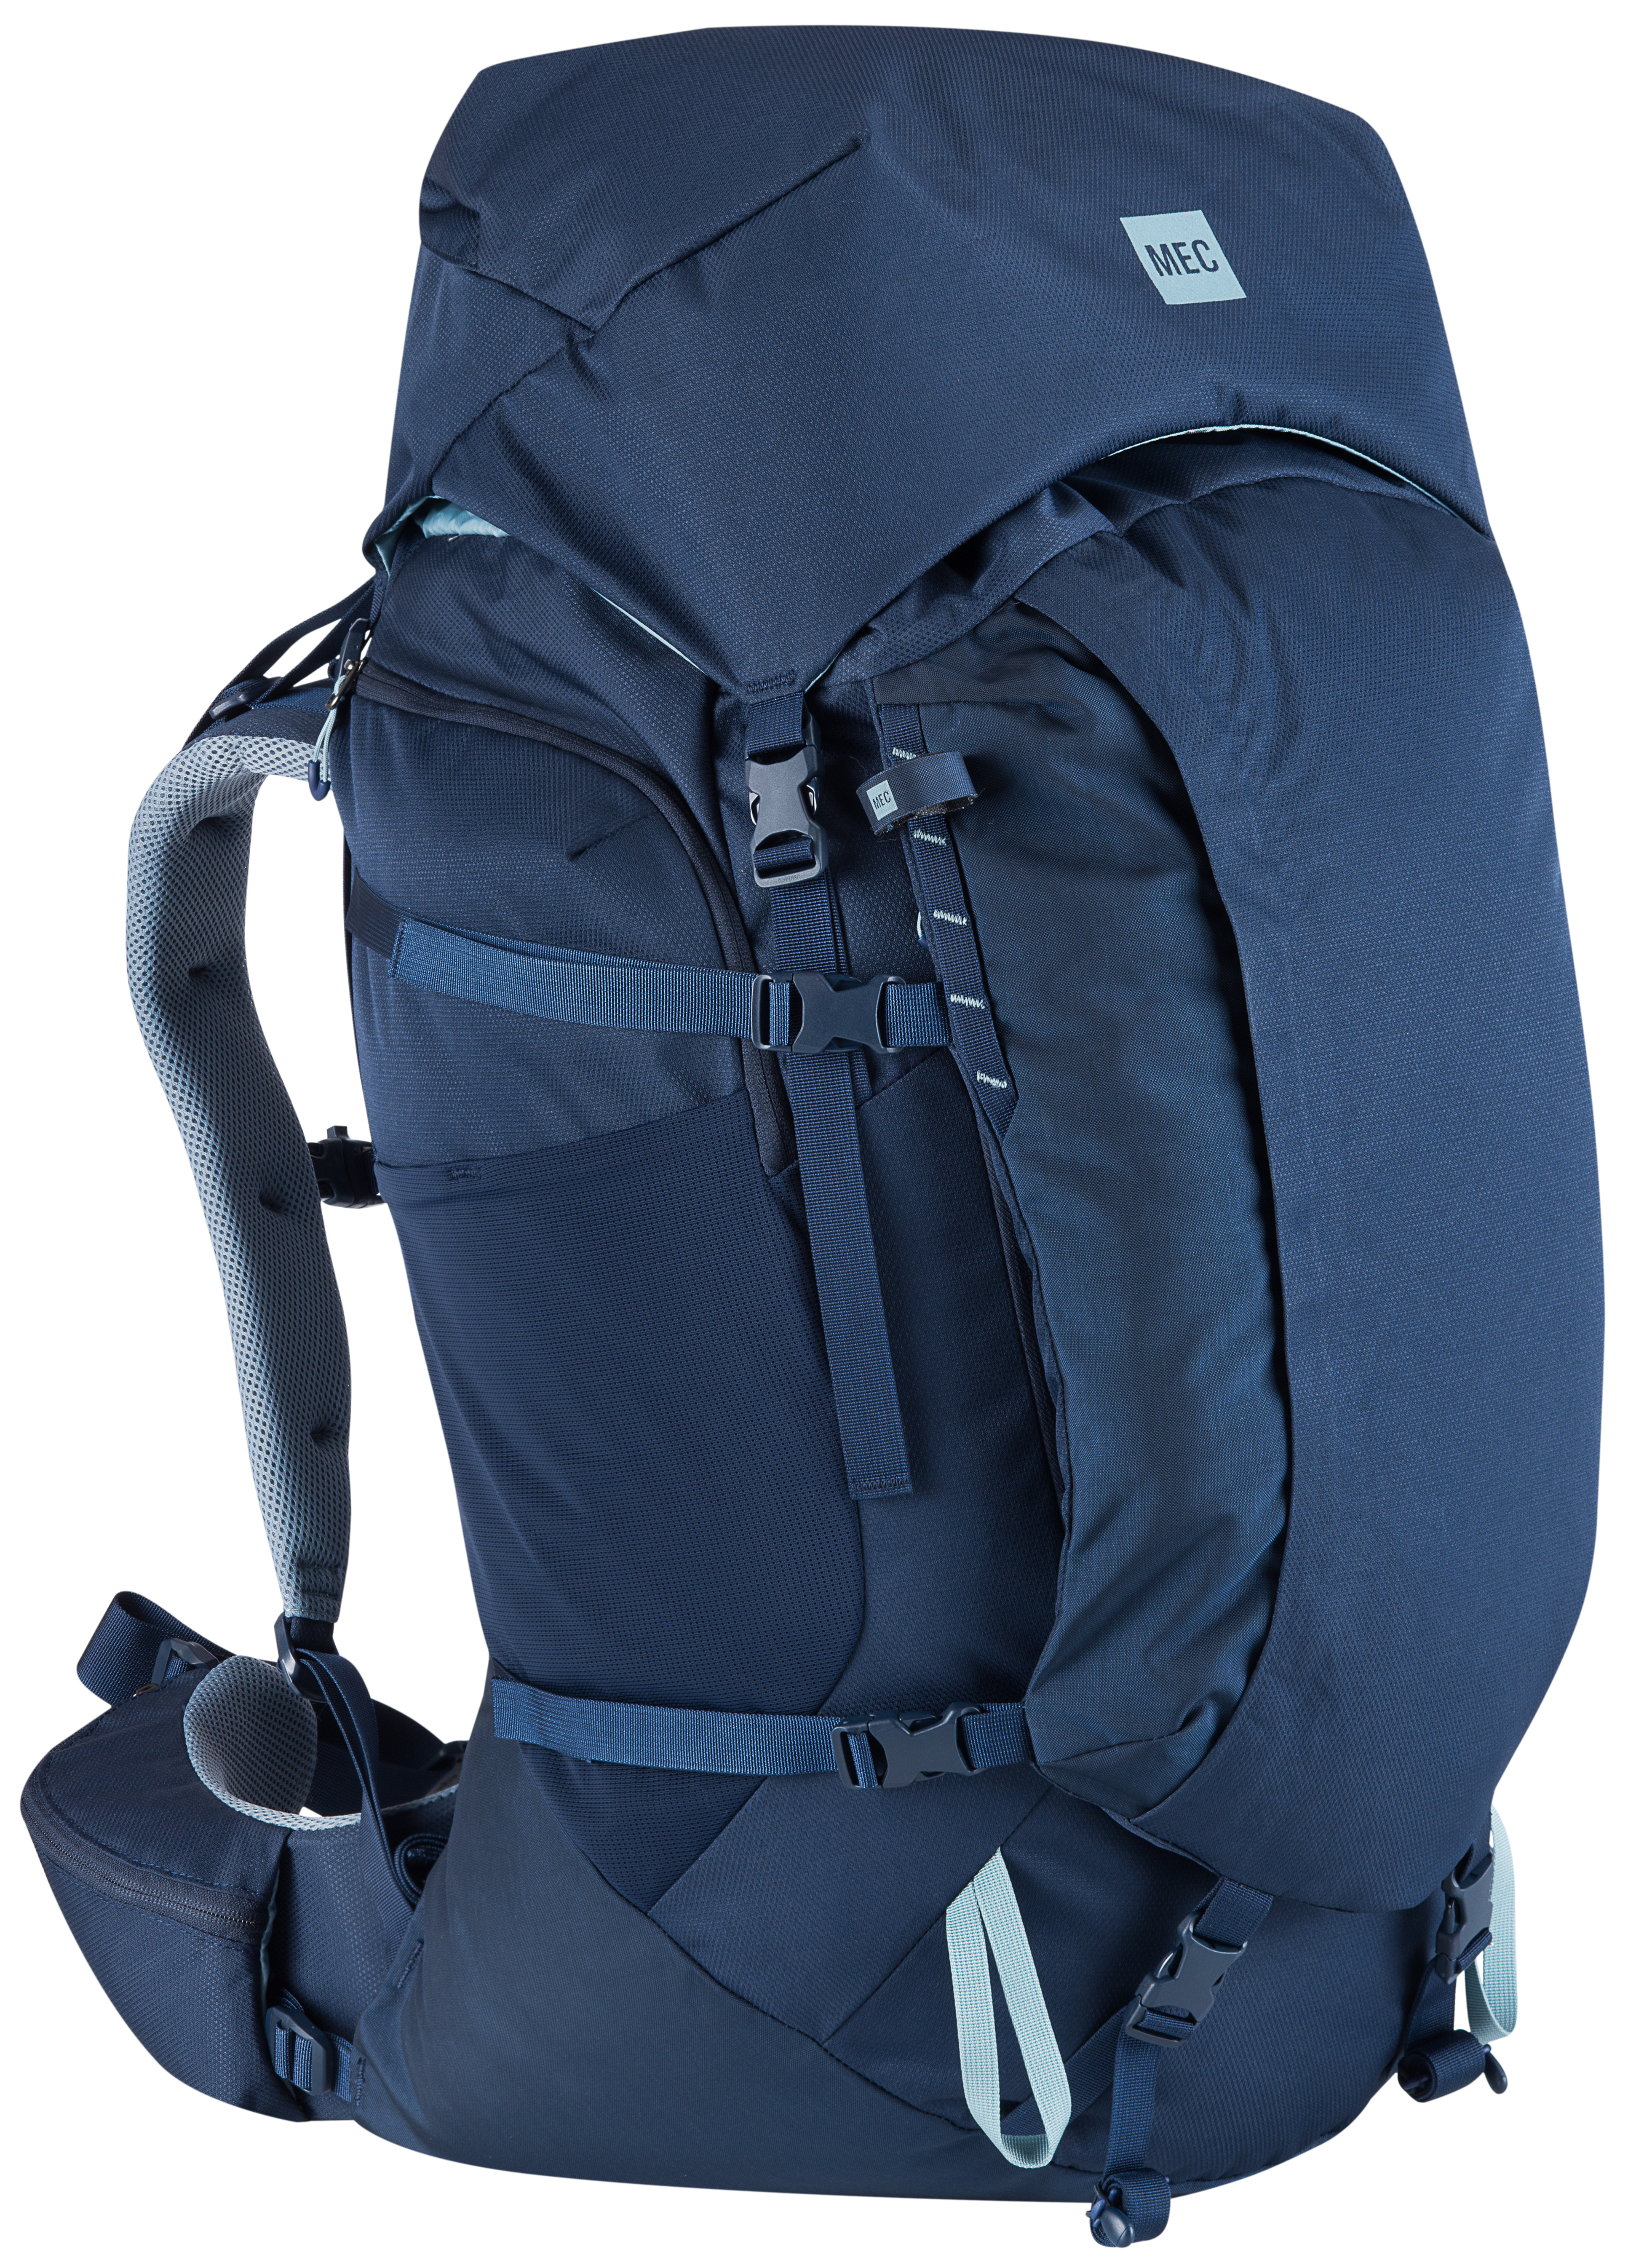 MEC Flair 70 Backpack - Women\u0027s